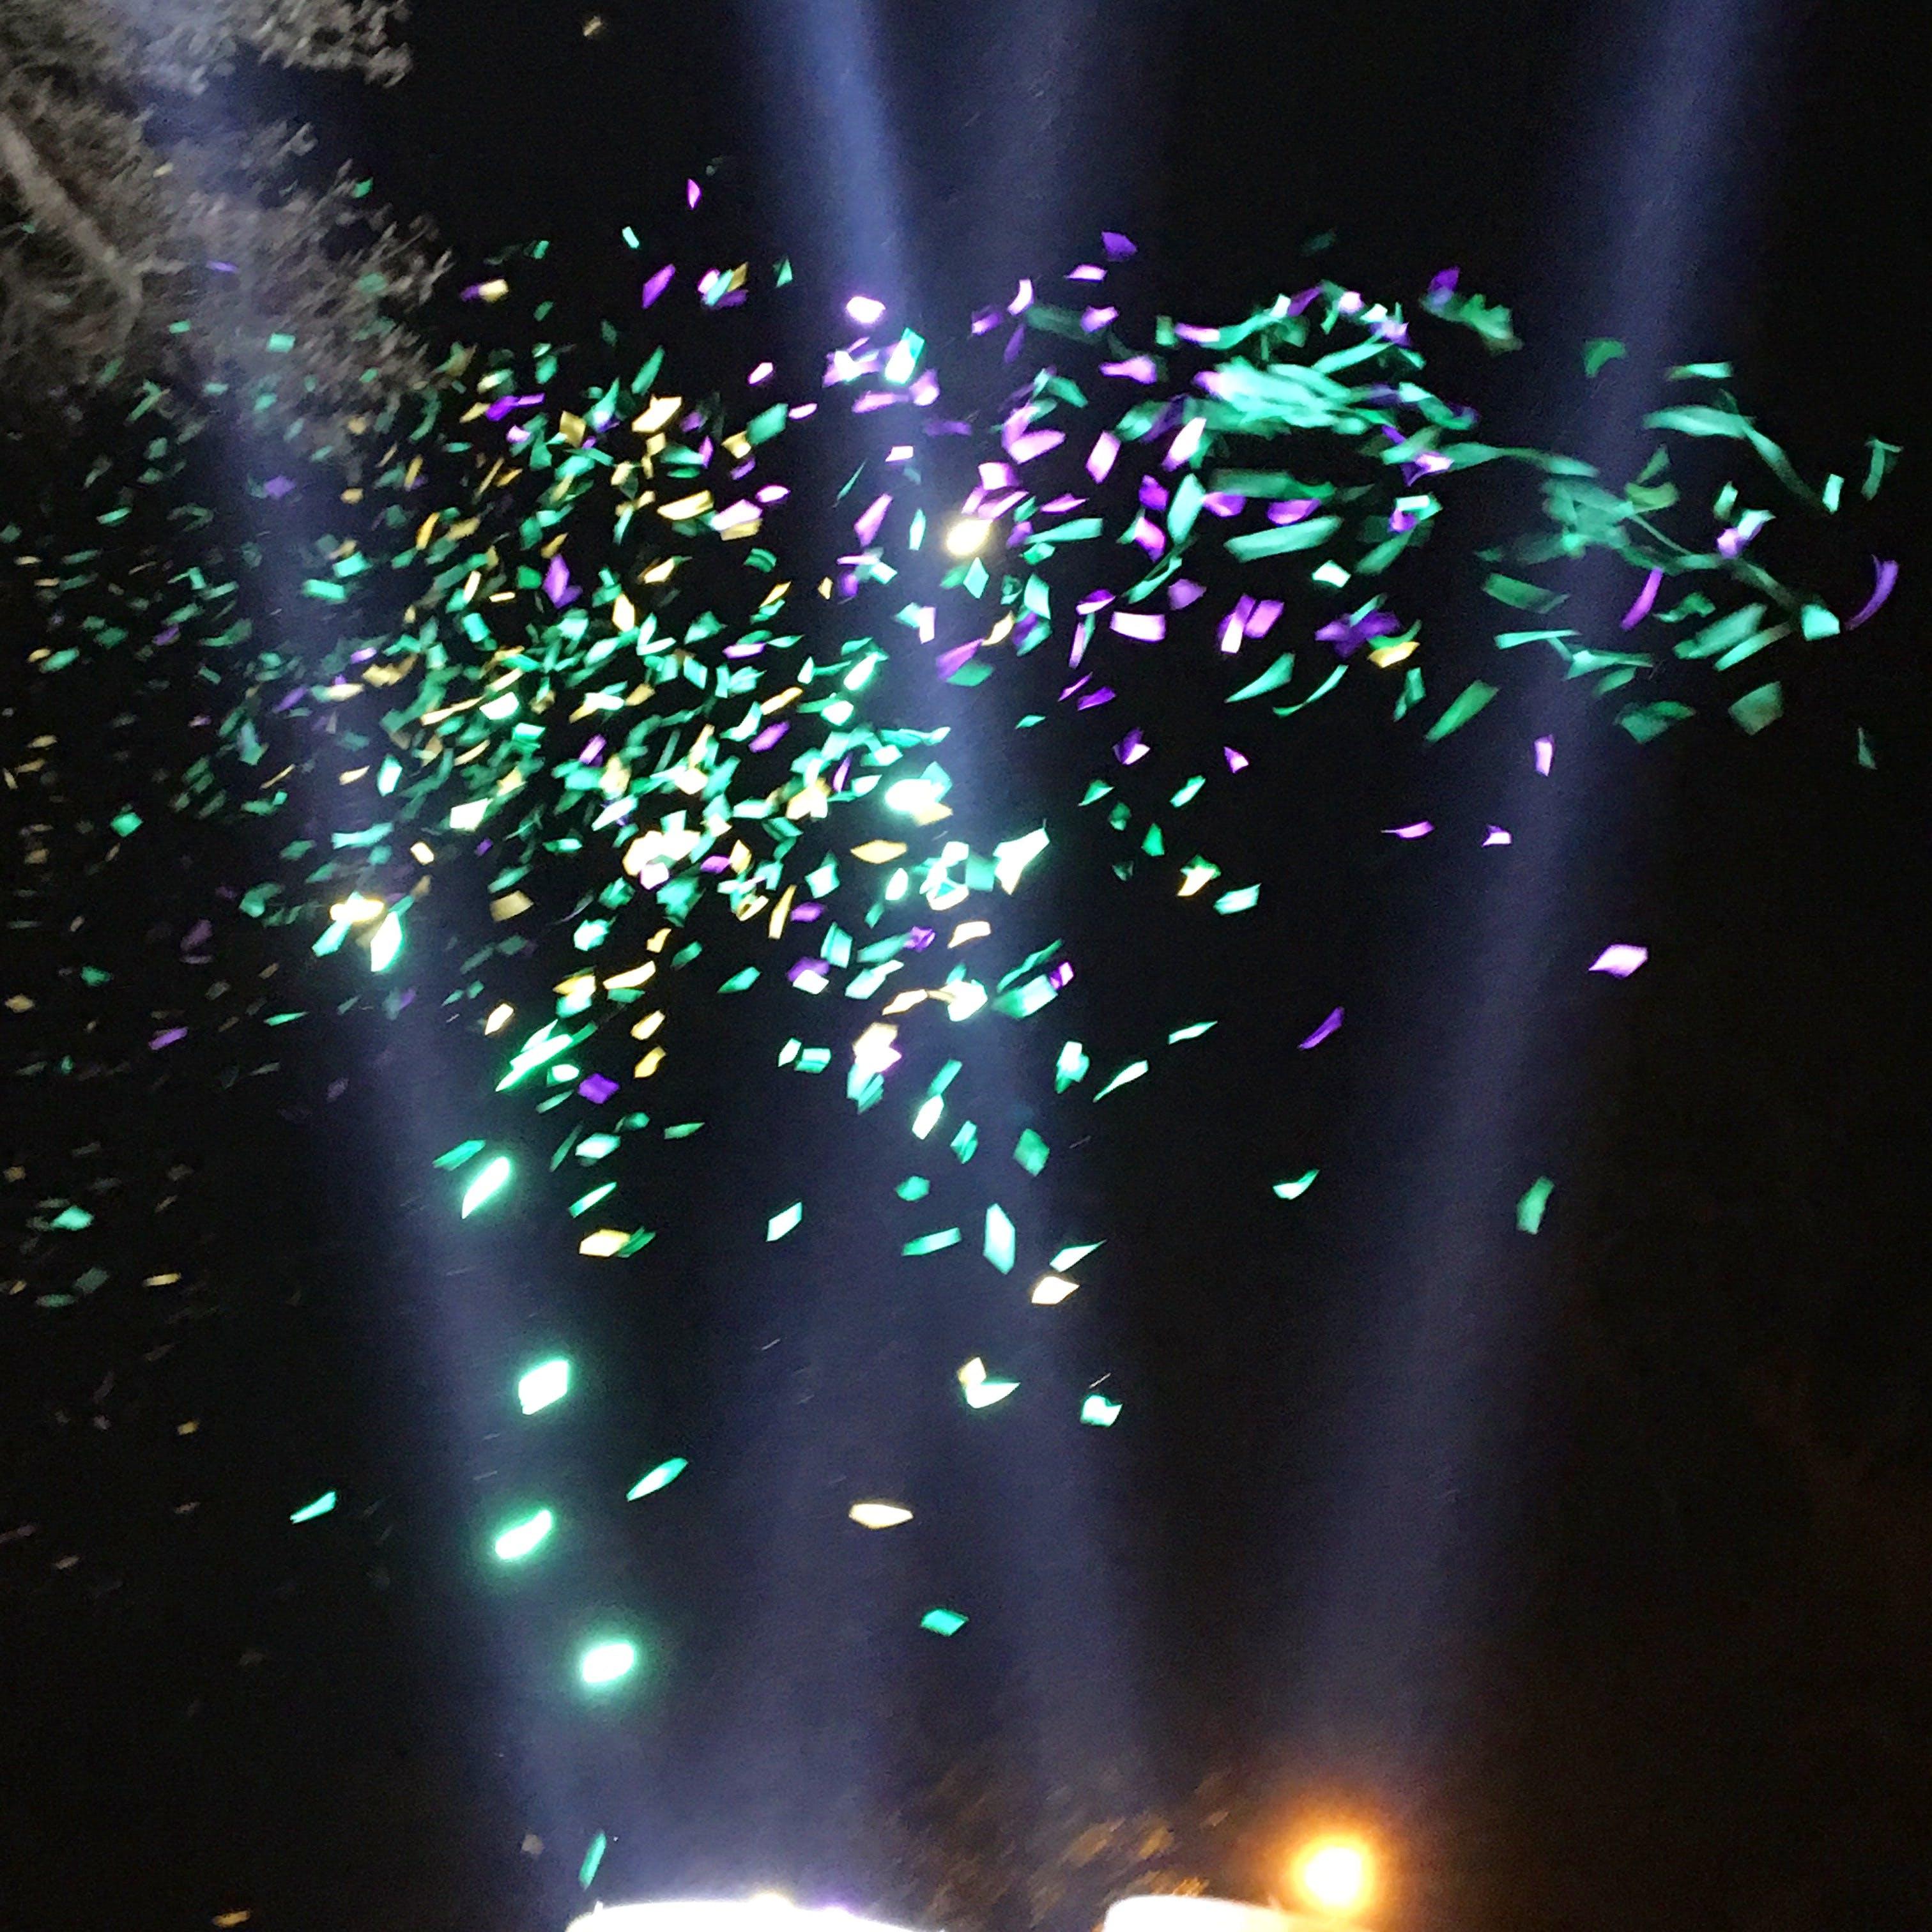 Free stock photo of confetti, mardi gras, spotlights